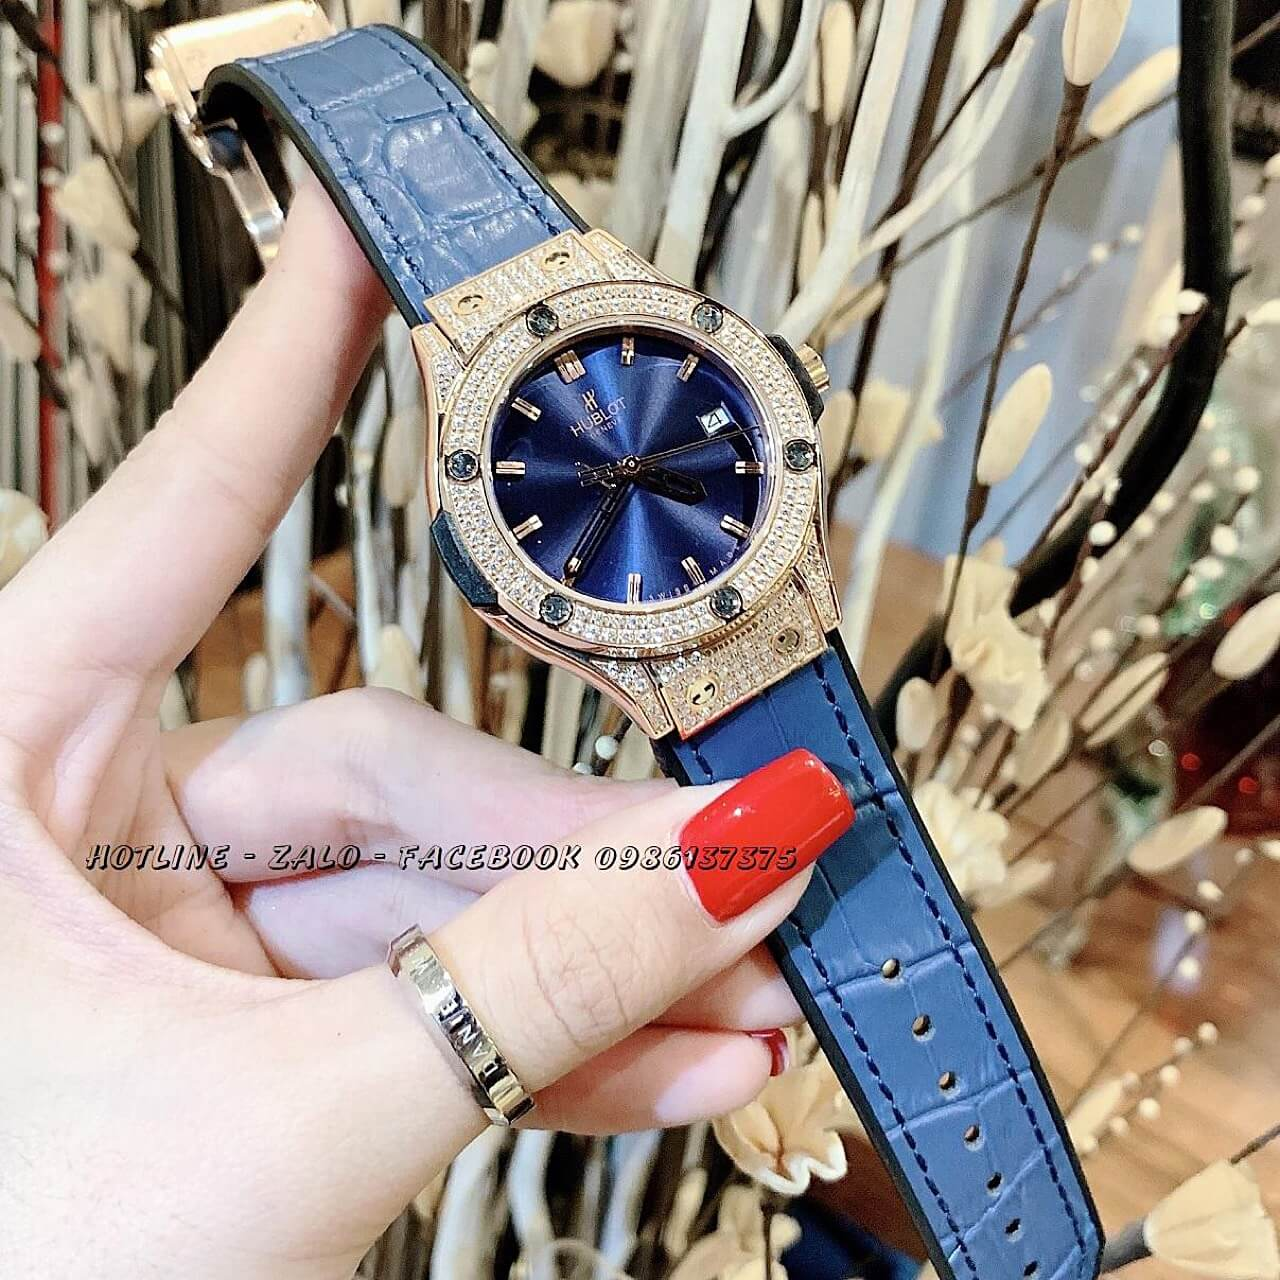 Đồng Hồ Hublot Nữ Da Silicon Blue Rose Gold 34mm